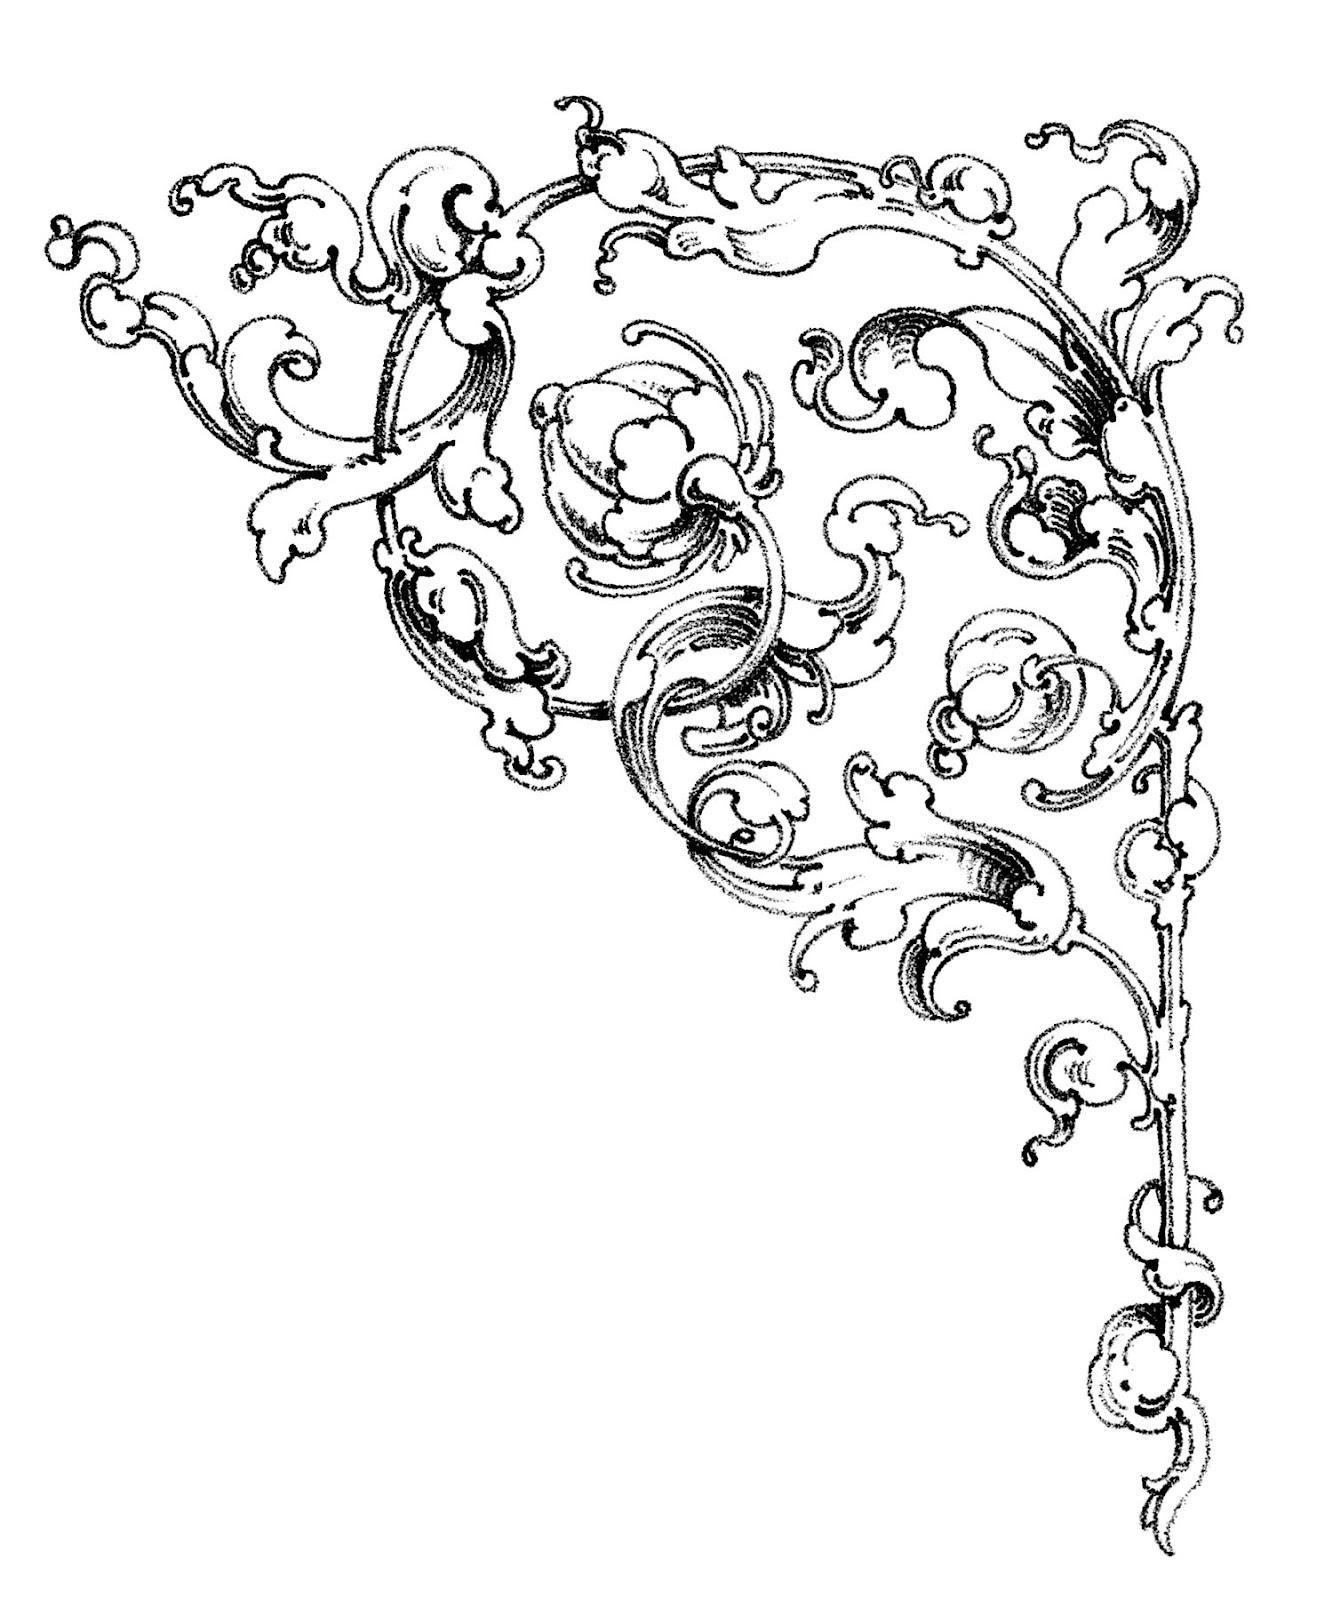 Free Wedding Scroll Clip Art N2 free image.